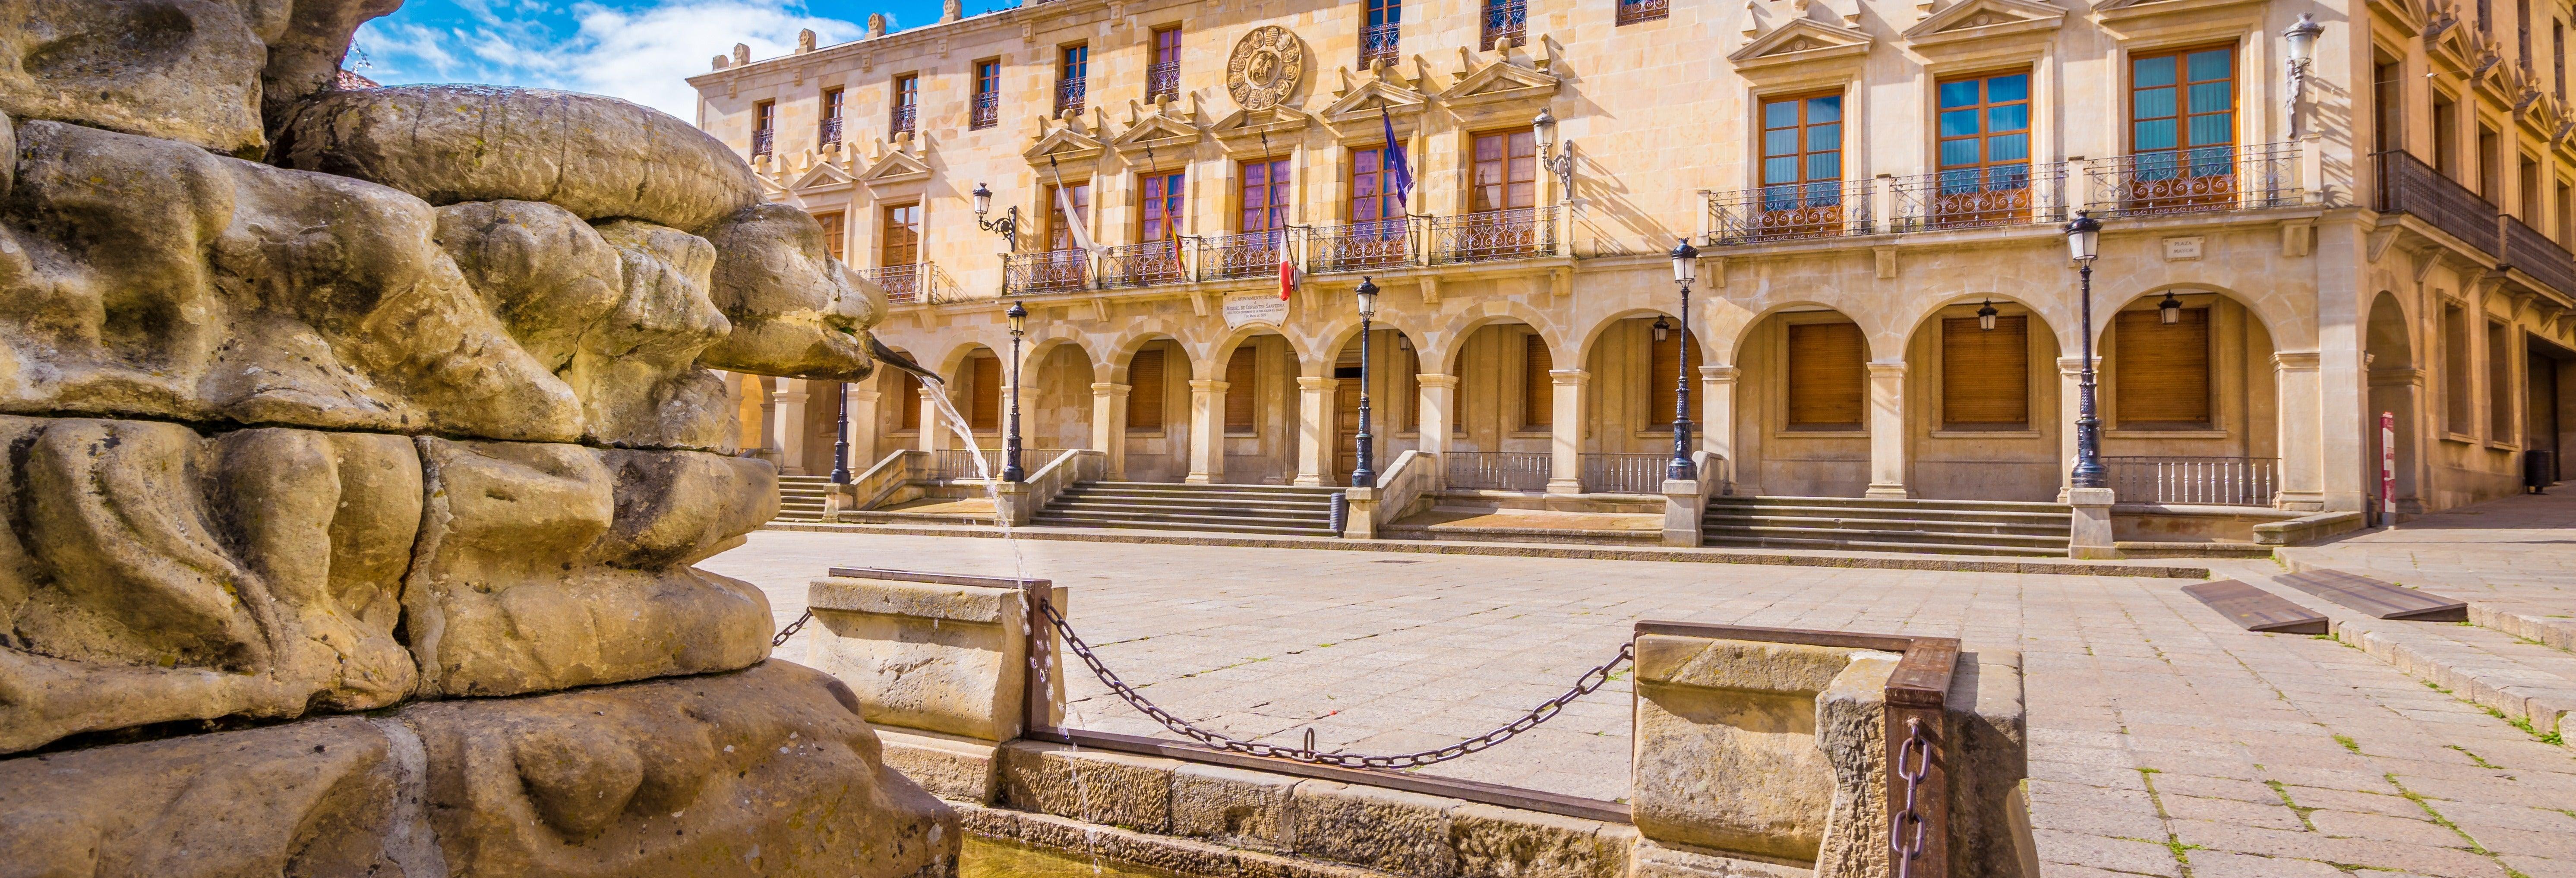 Tour de misterios y leyendas por Soria